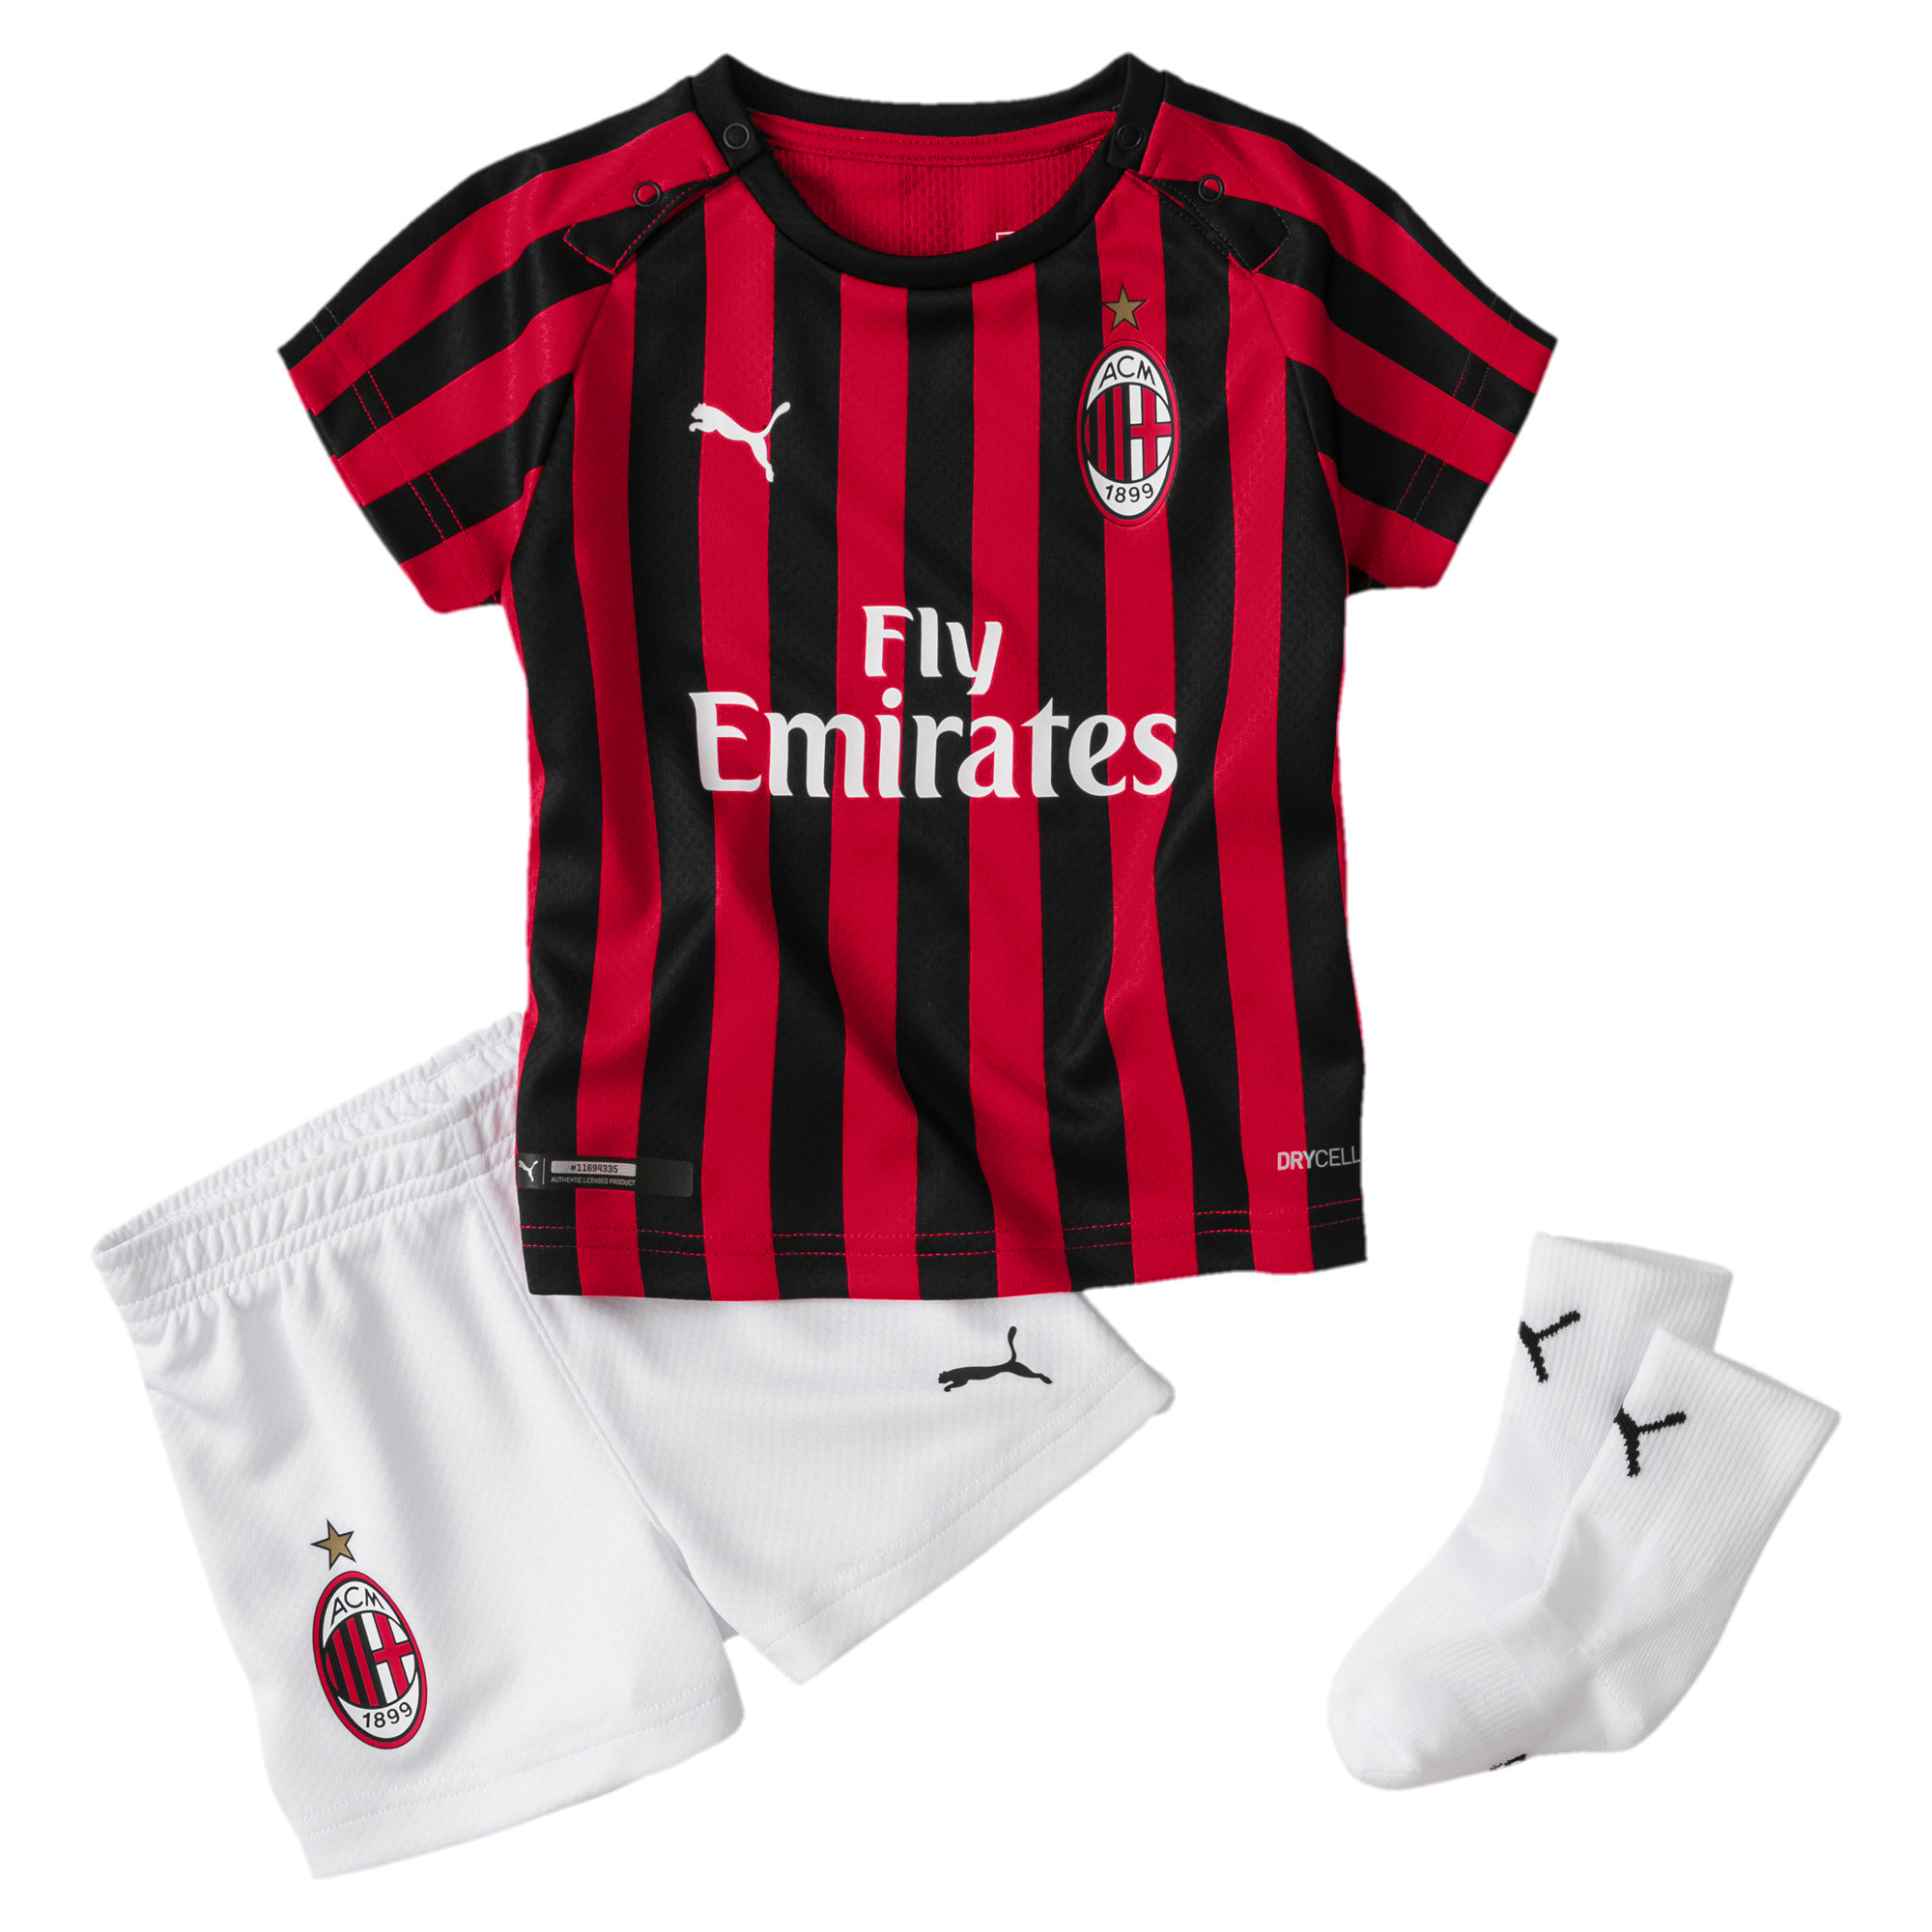 Thumbnail 1 of AC Milan Home Babies' Mini Kit With Socks, Tango Red -Puma Black, medium